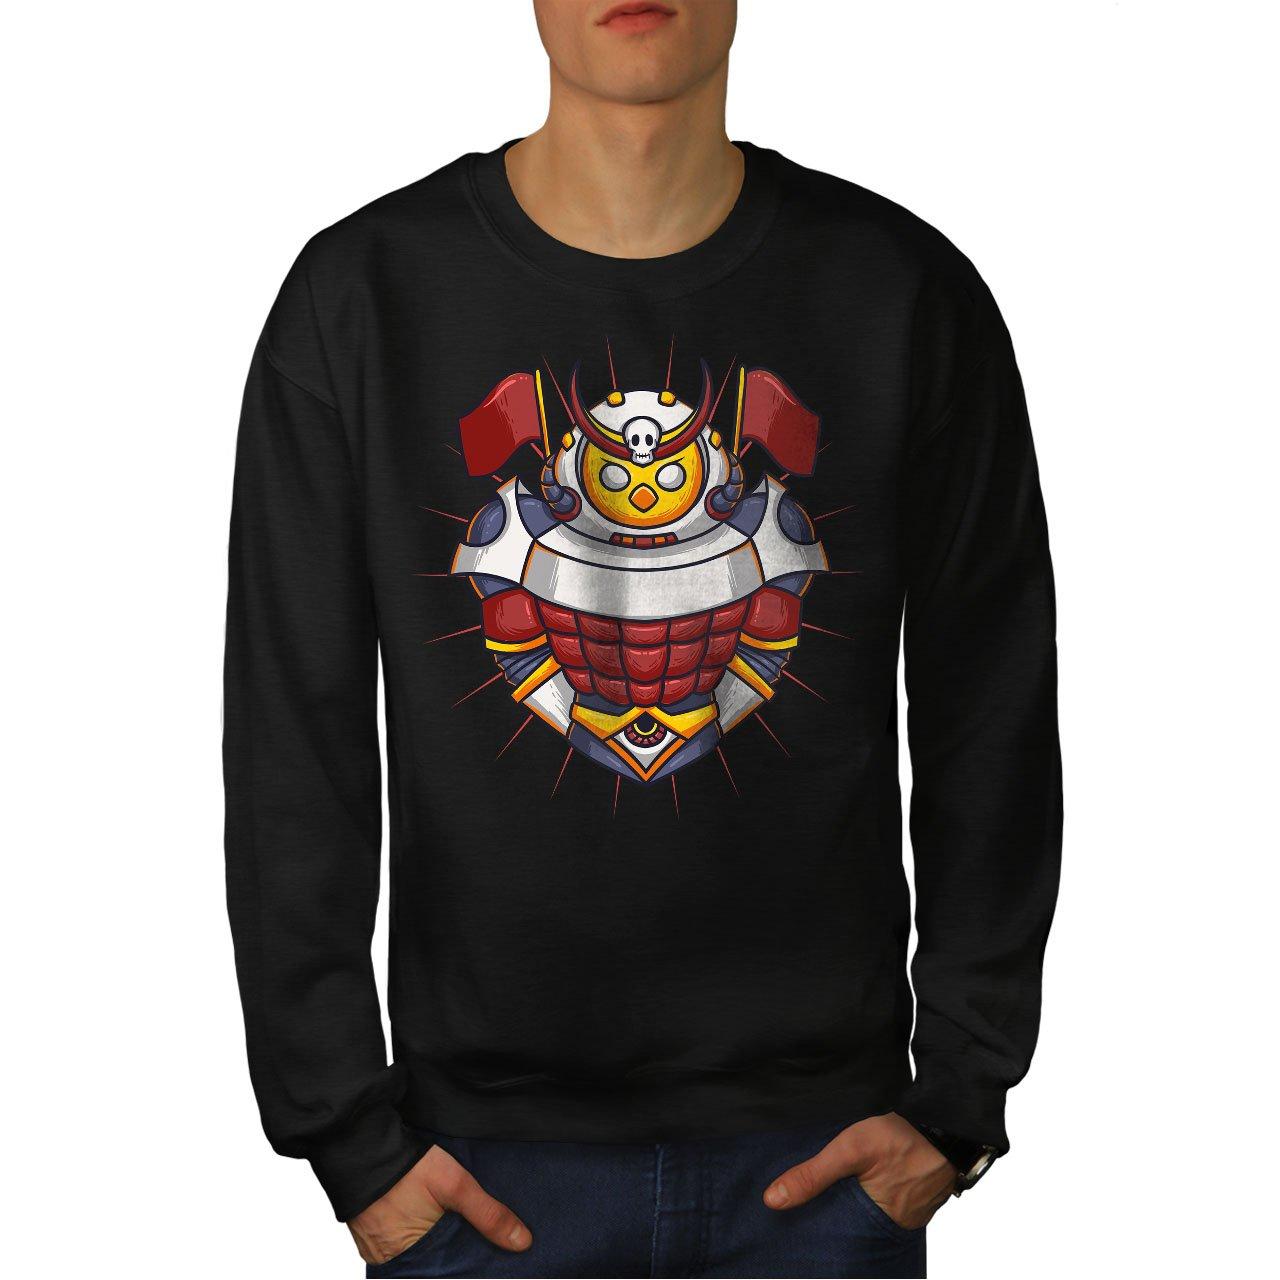 wellcoda Knight Colorful Mens Sweatshirt Drawn Creature Casual Jumper